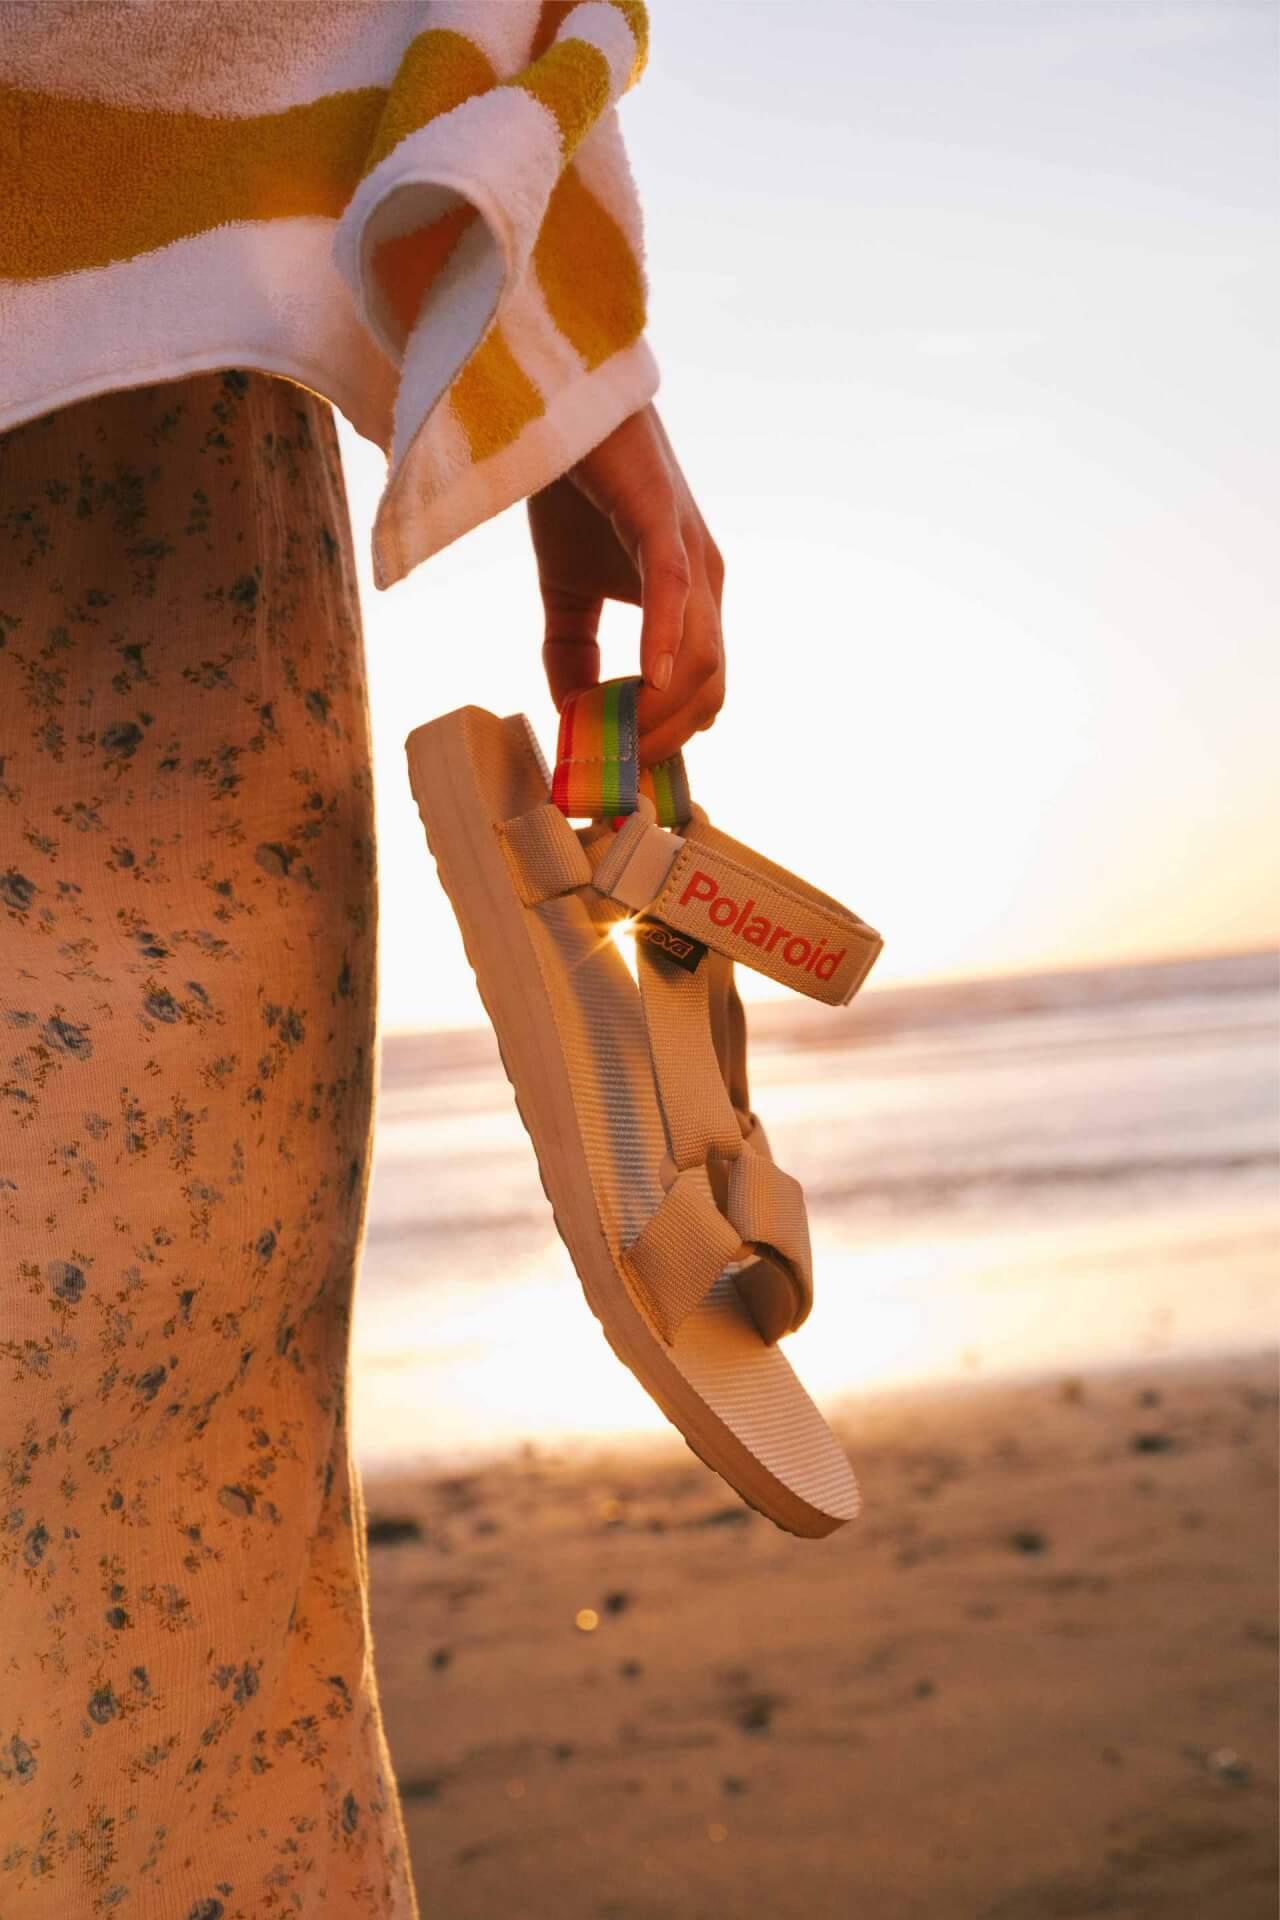 Tevaと世界初のインスタントカメラブランドPolaroidのコラボサンダルが本日発売! life210506_teva_polaroid_3